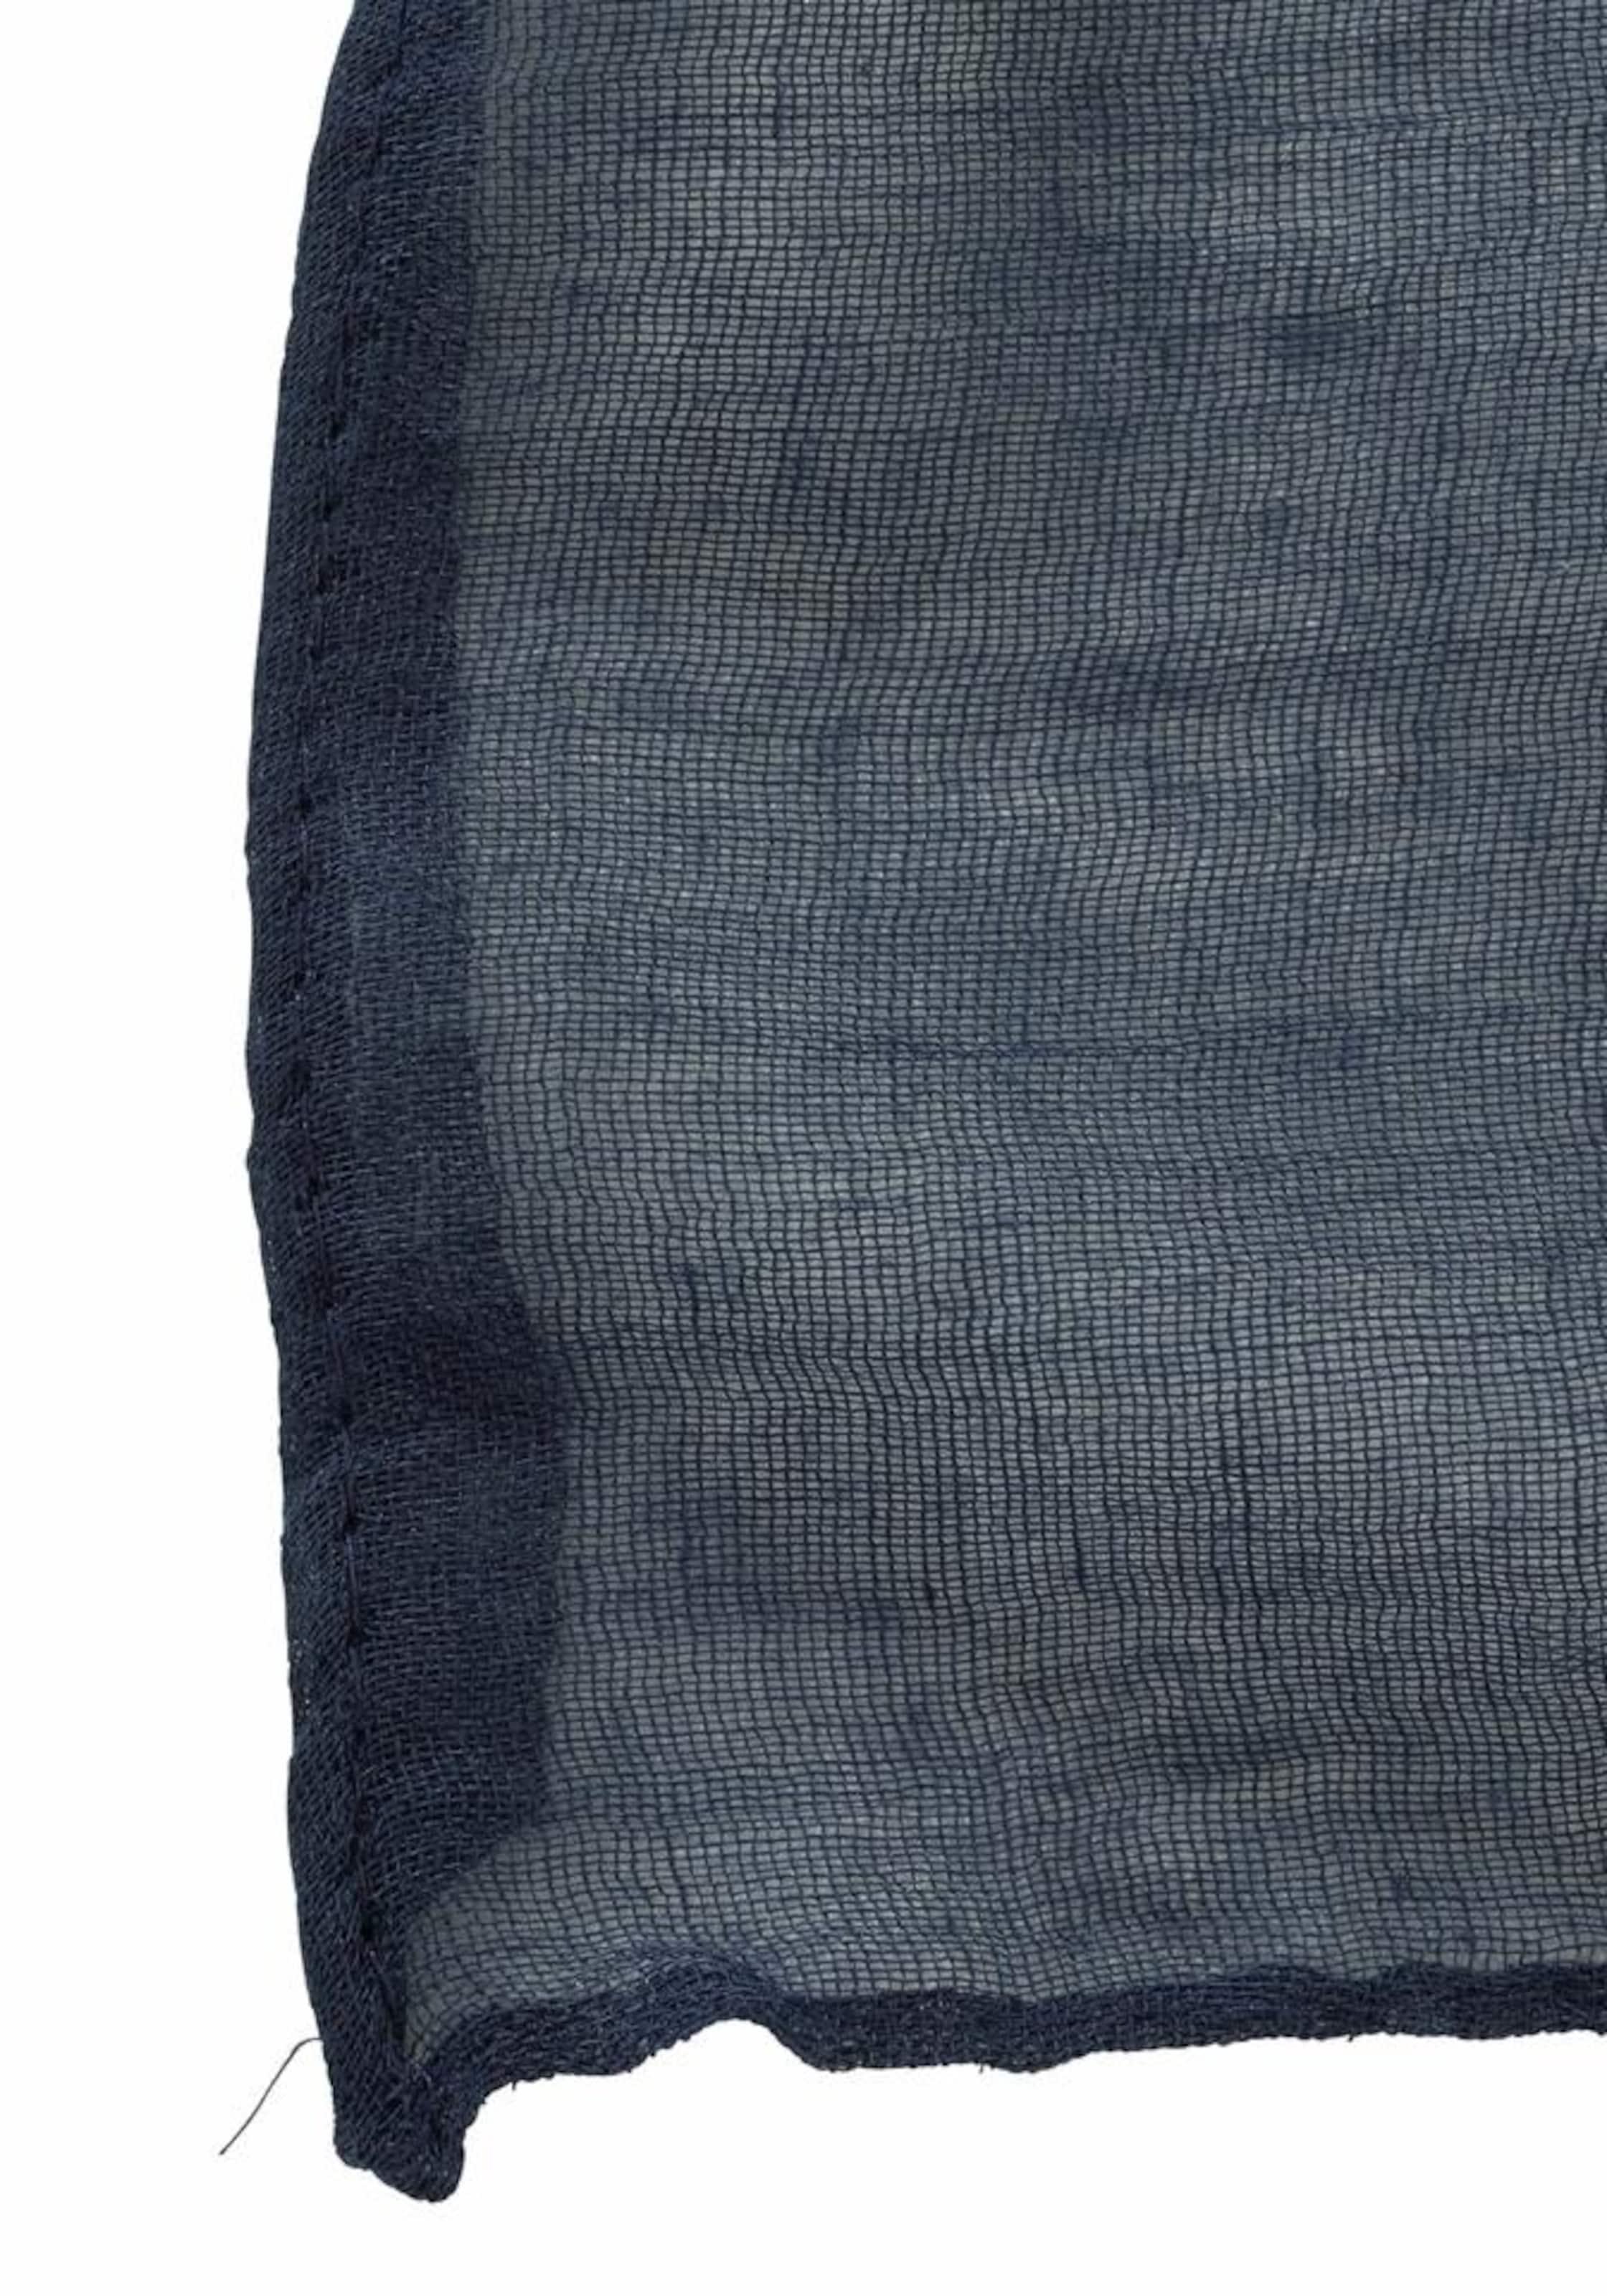 J. Jayz Modeschal Billig Verkauf Großhandelspreis Auslass-Angebote 8c8GG2